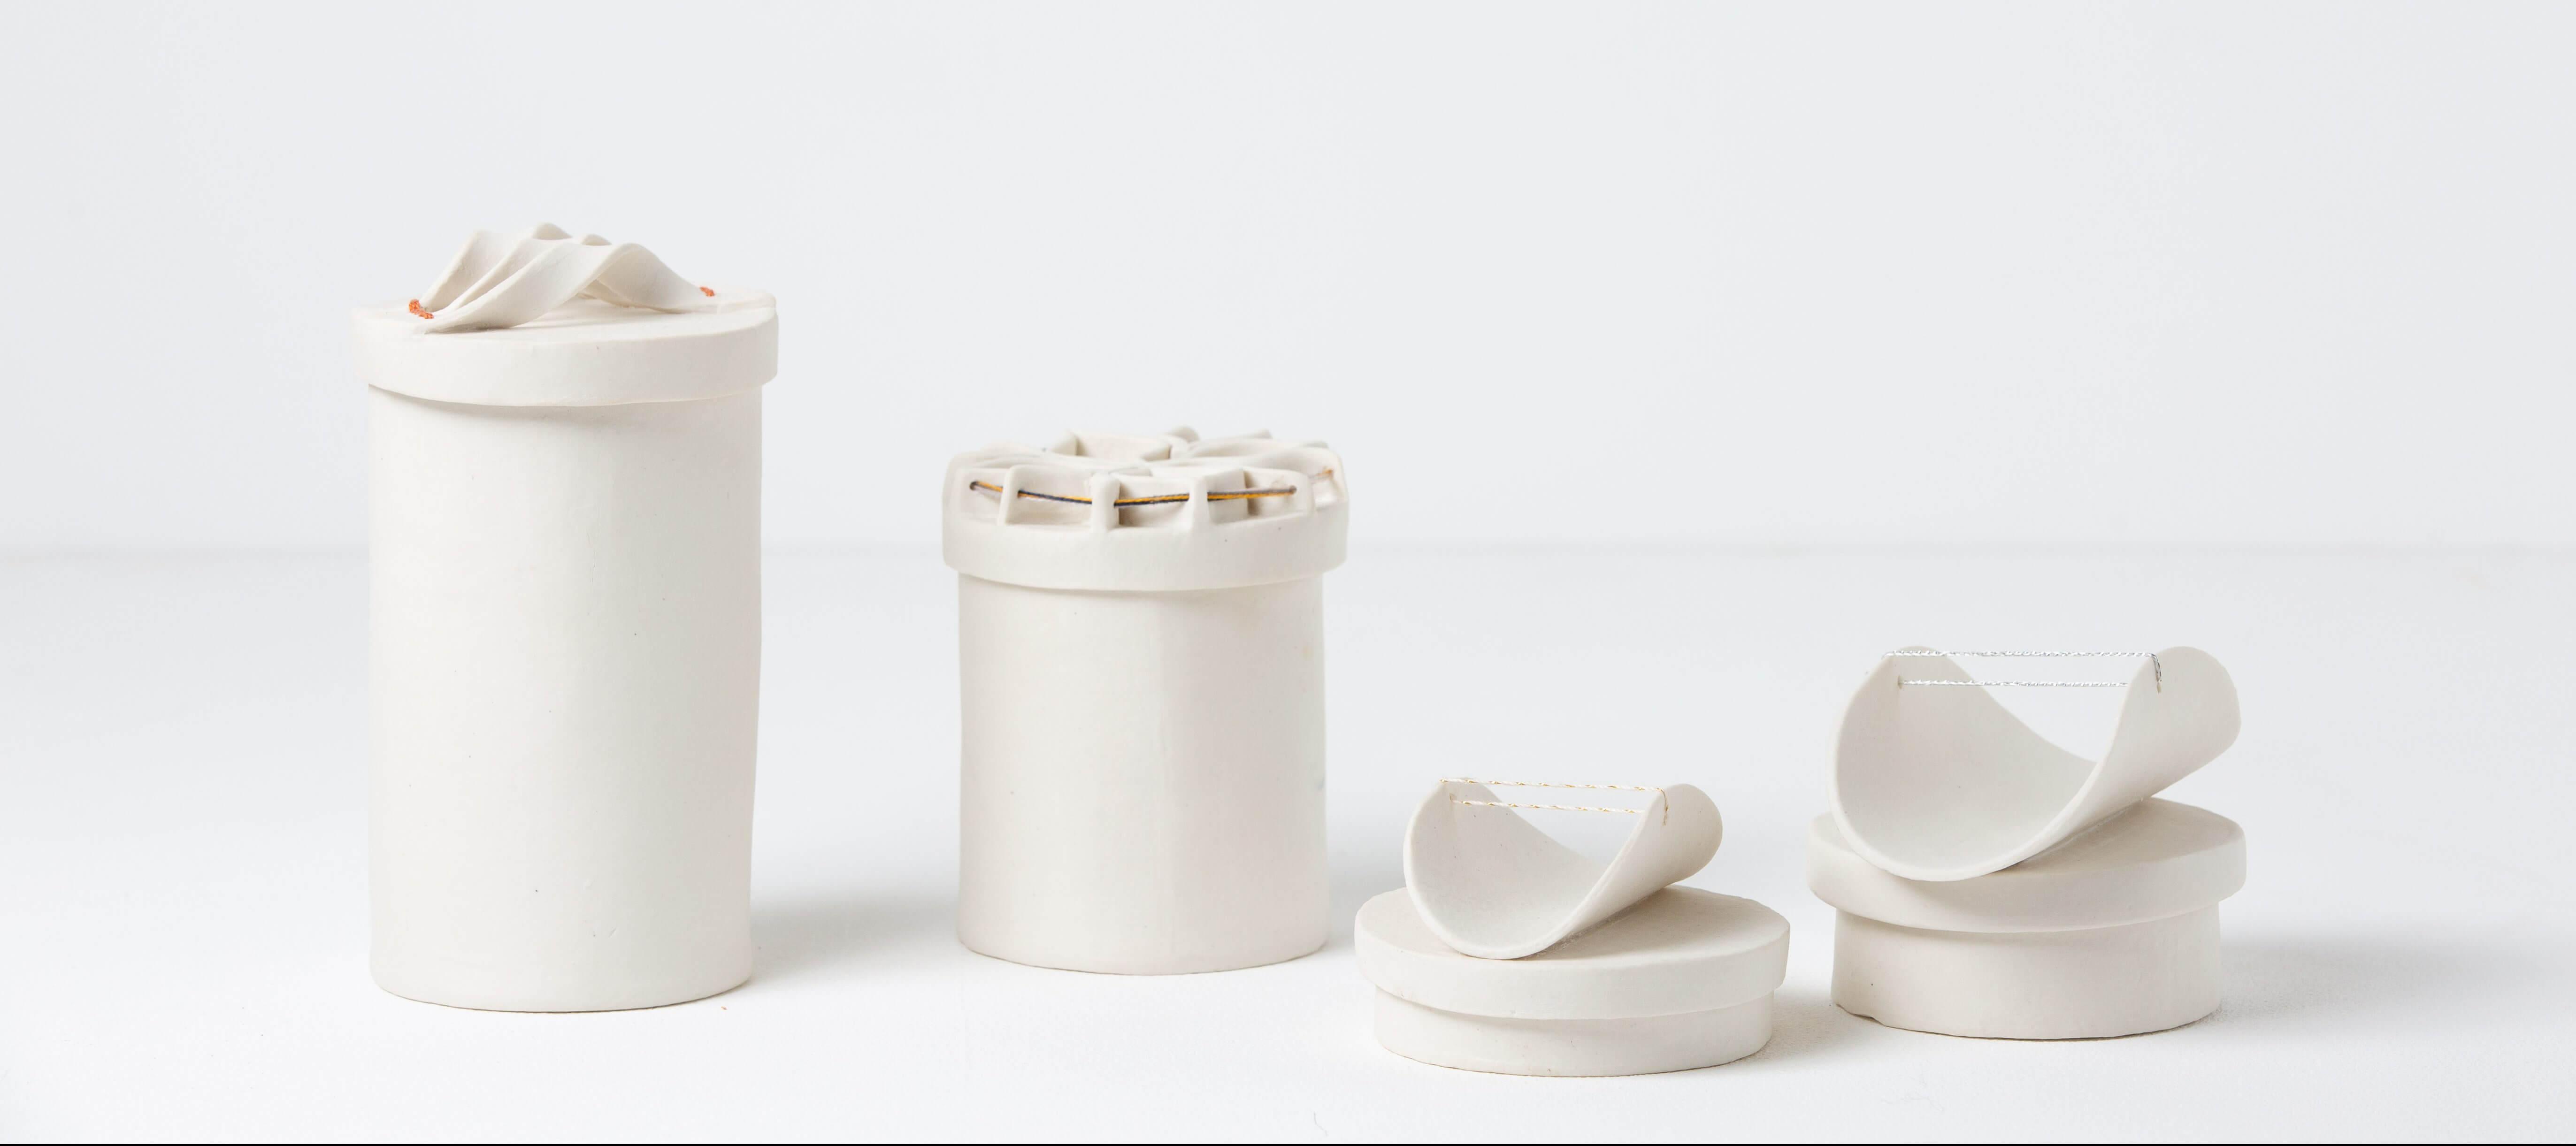 Intermediate Hand Building / Porcelain / Eliya Levi Yunger